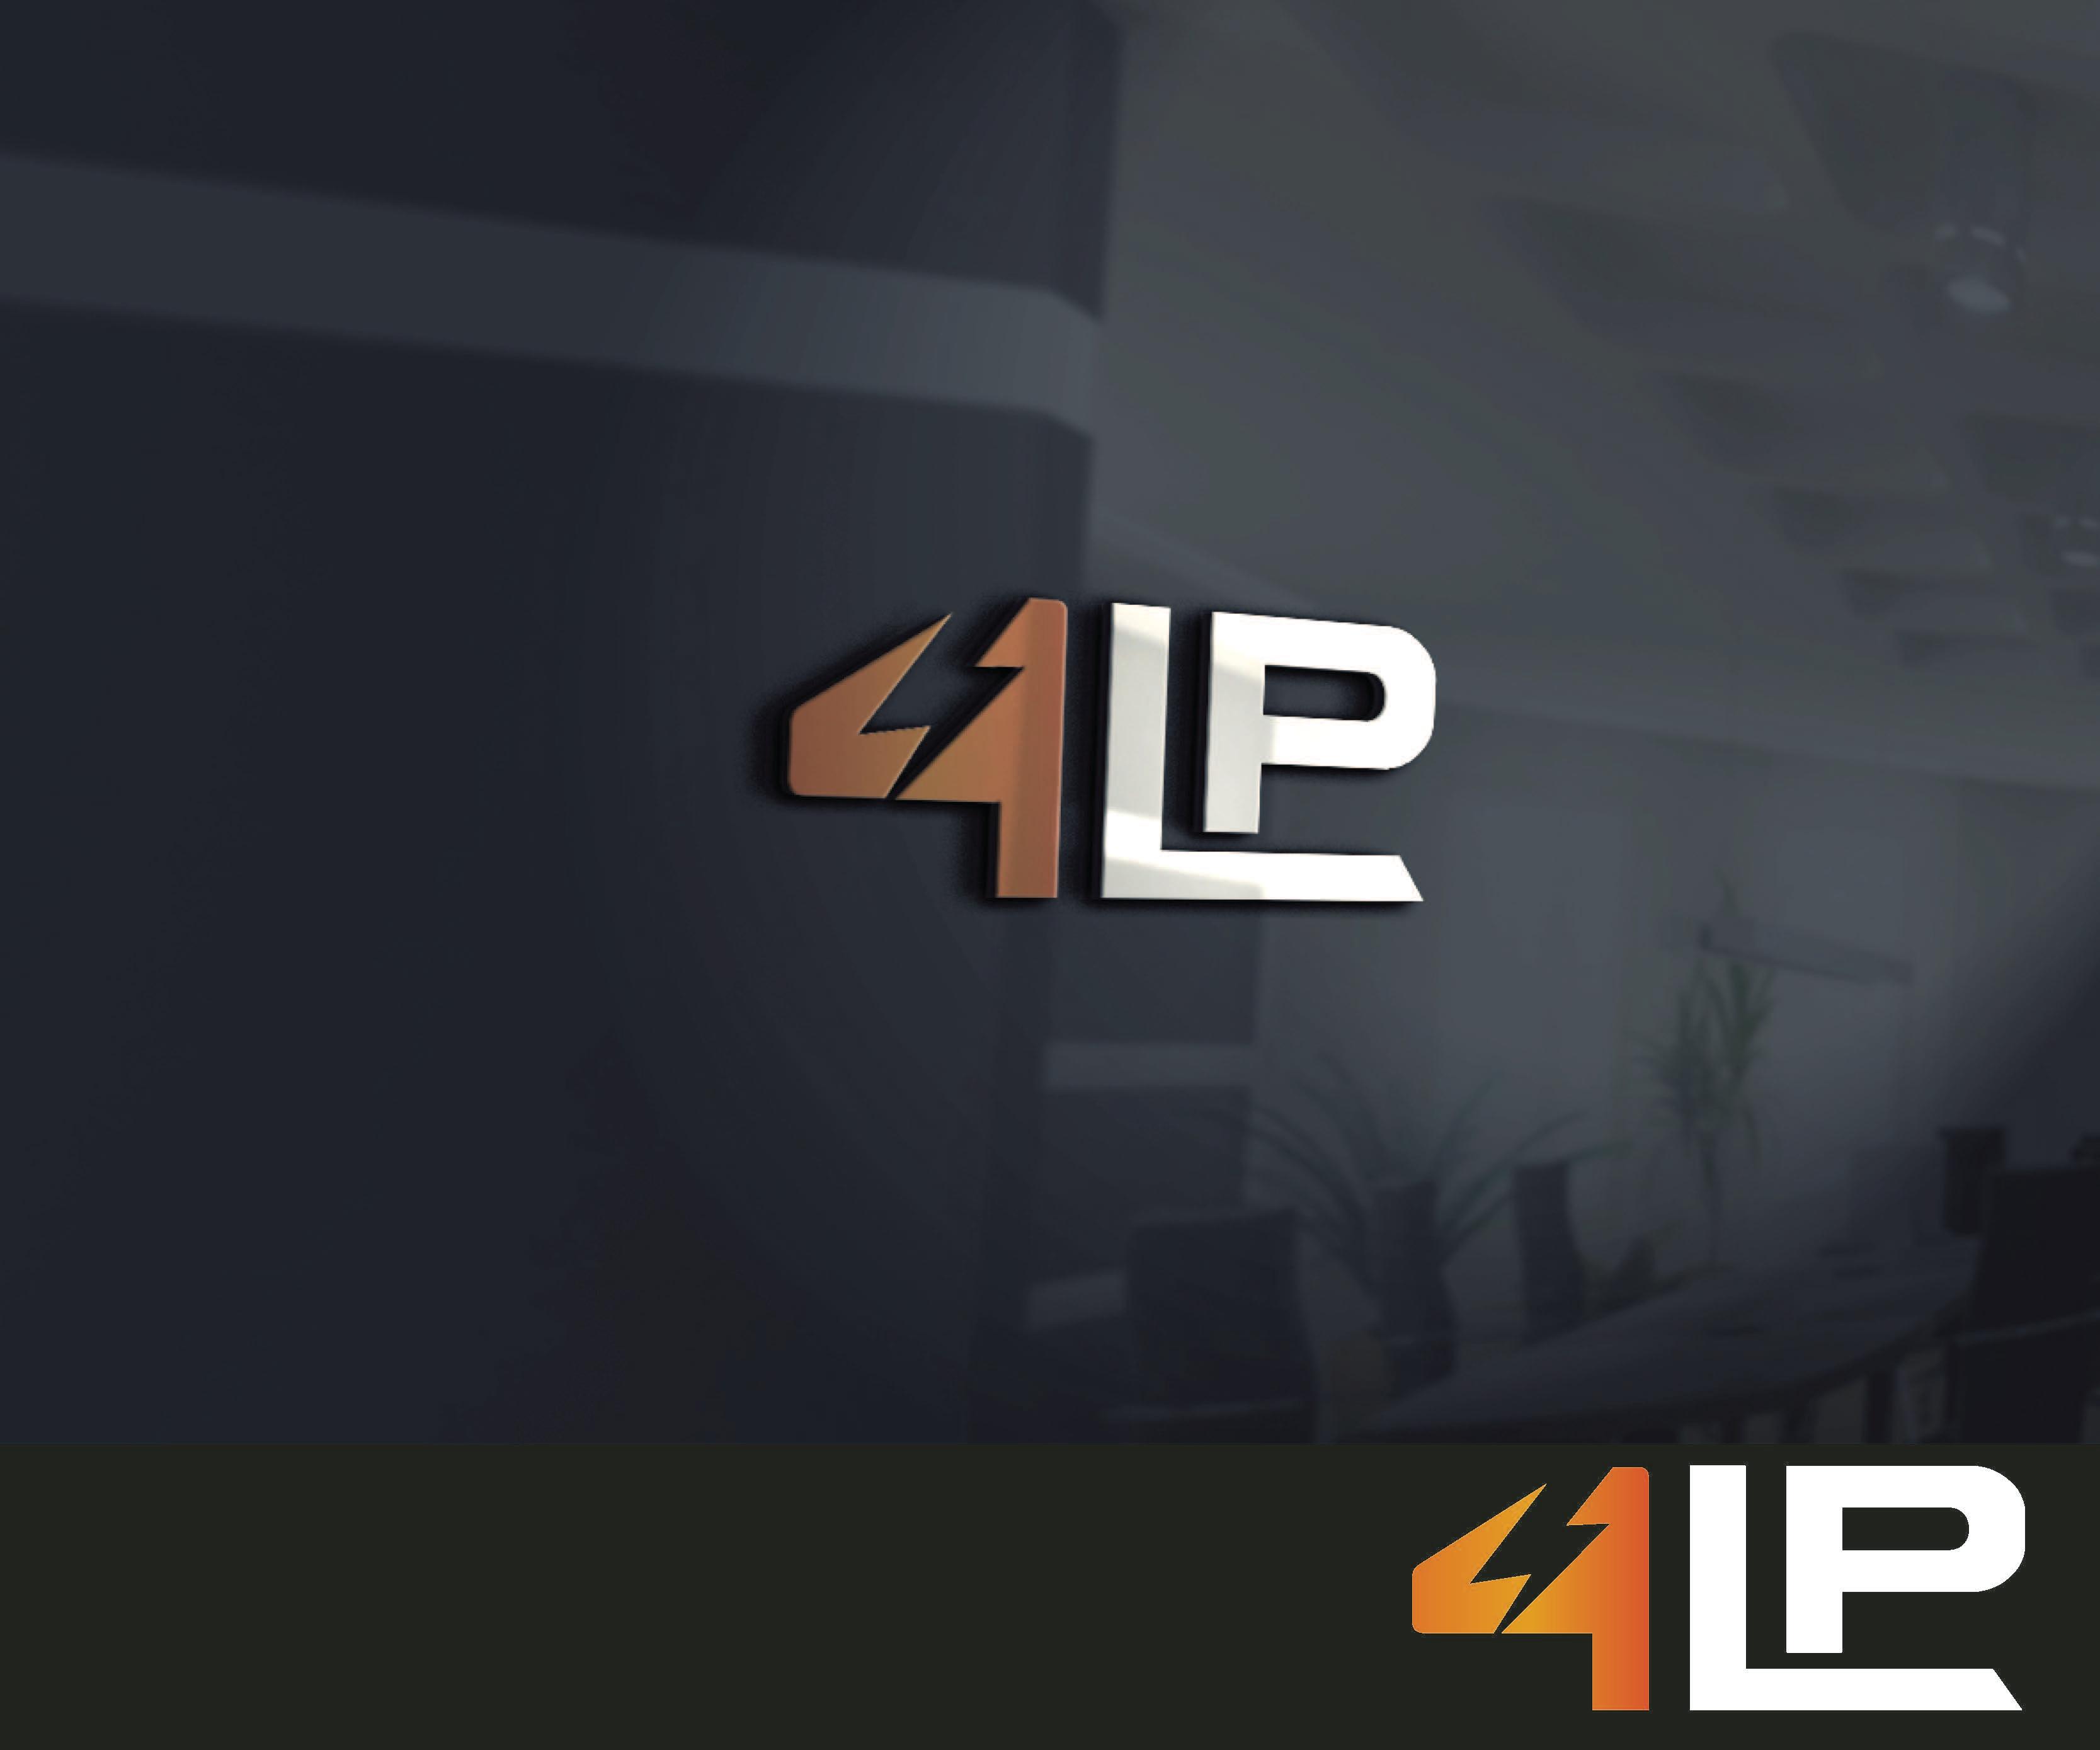 4LP, LLC image 0